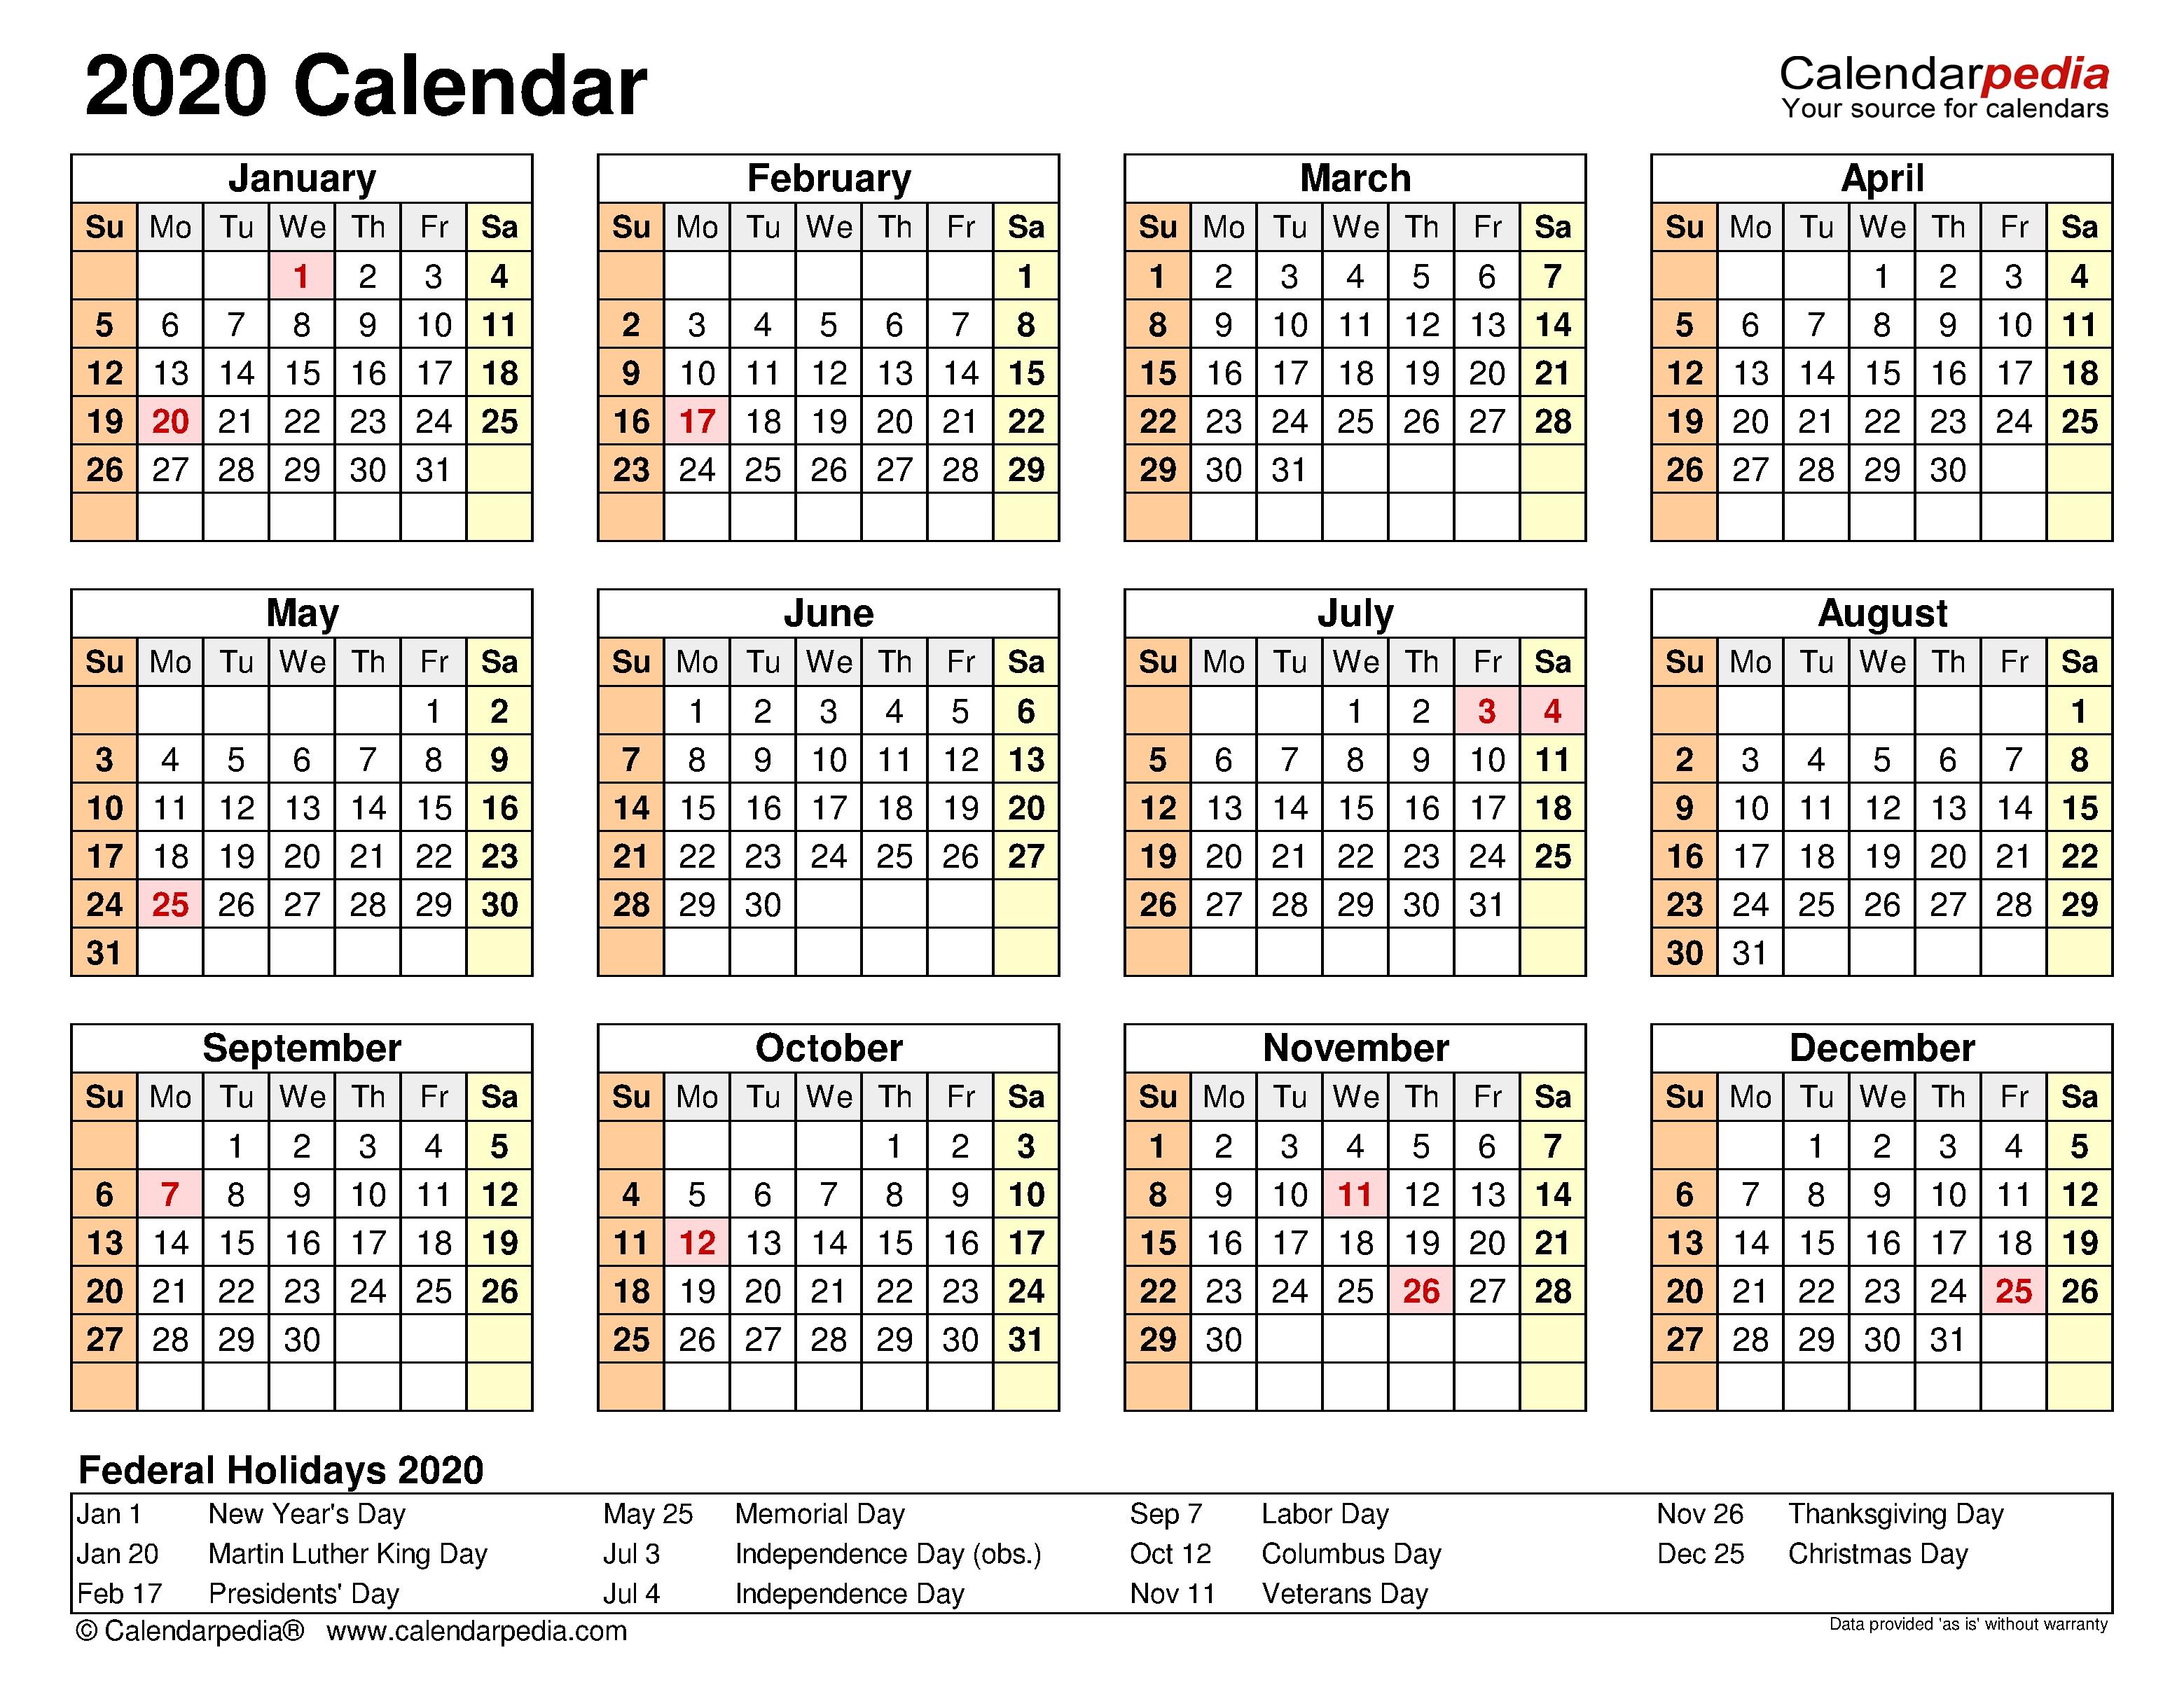 2020 Calendar - Free Printable Microsoft Word Templates inside Employee Attendance Calendar 2020 Printable